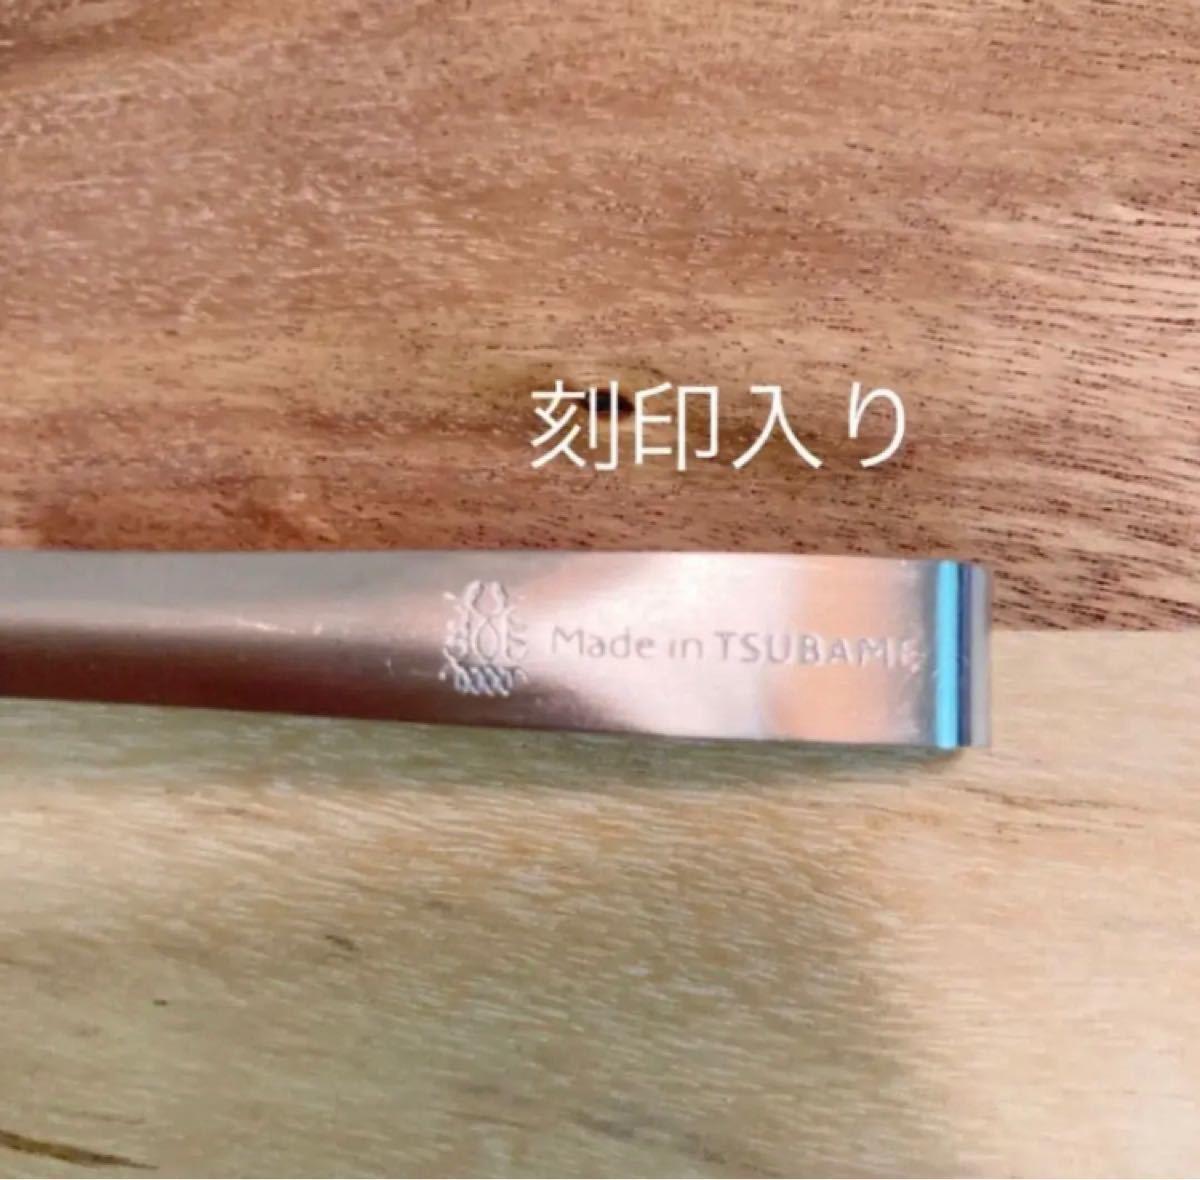 MADE in TSUBAME ミニトング 5本セット 新品 日本製 新潟県燕市燕三条 刻印入り